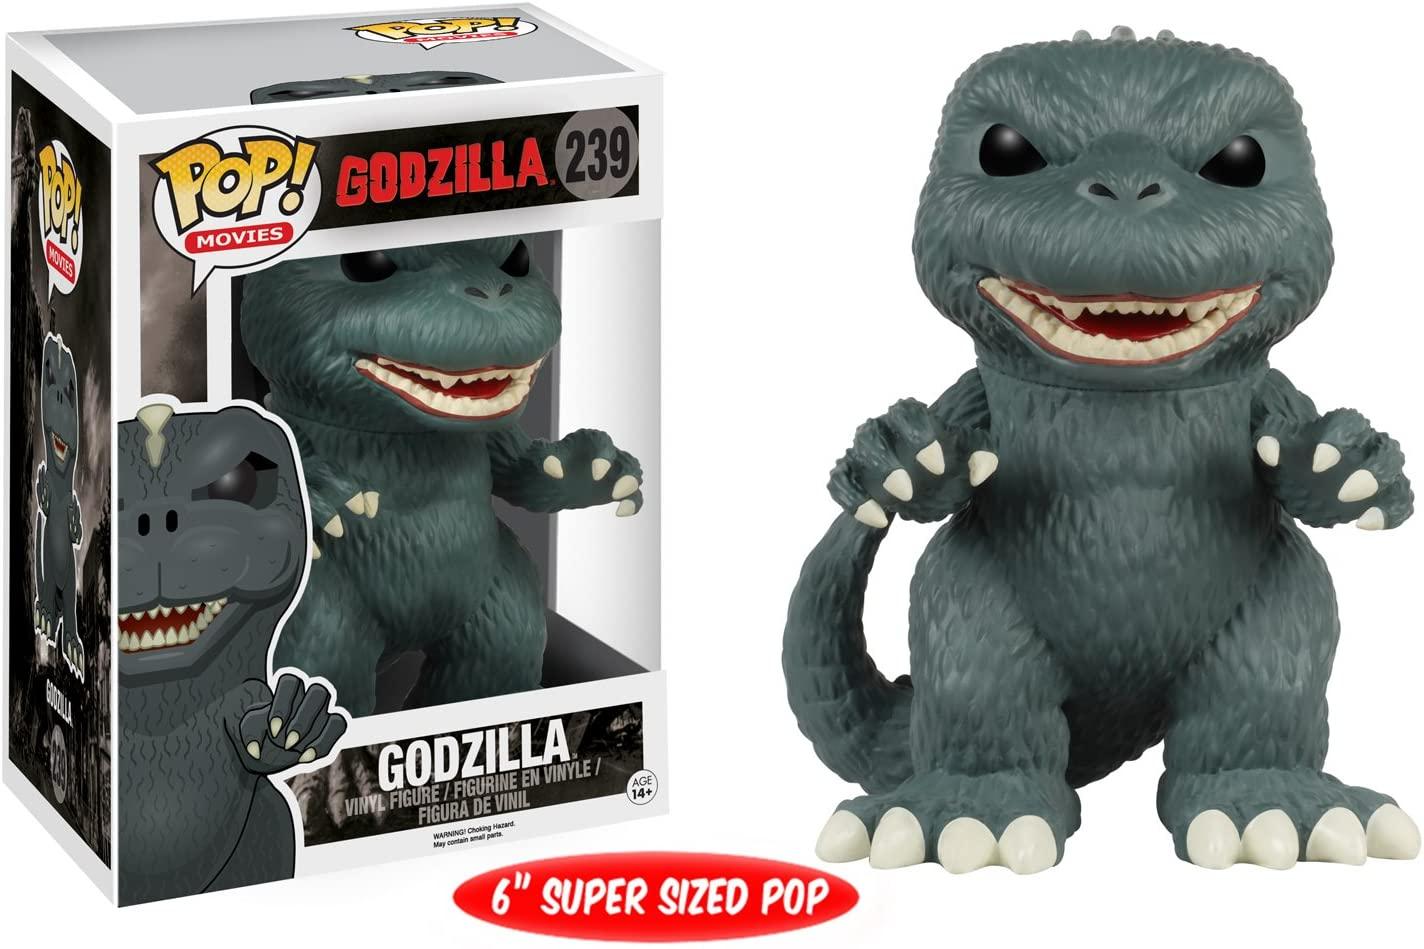 Funko Pop Godzilla Action Figure